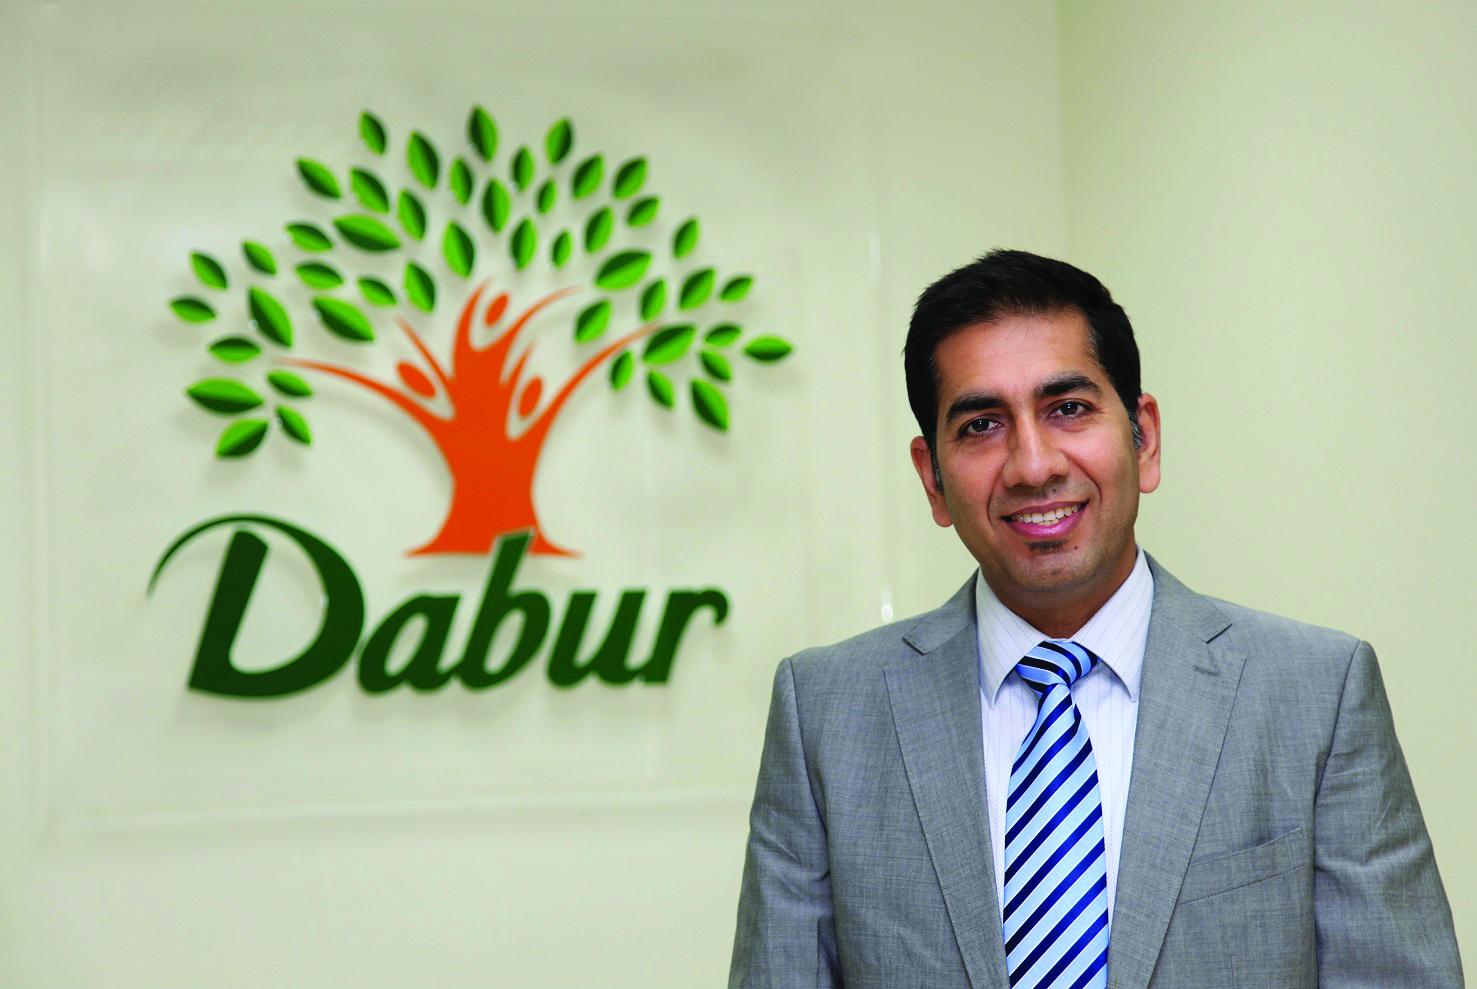 Dabur International named 'Global Retailer of the Year'